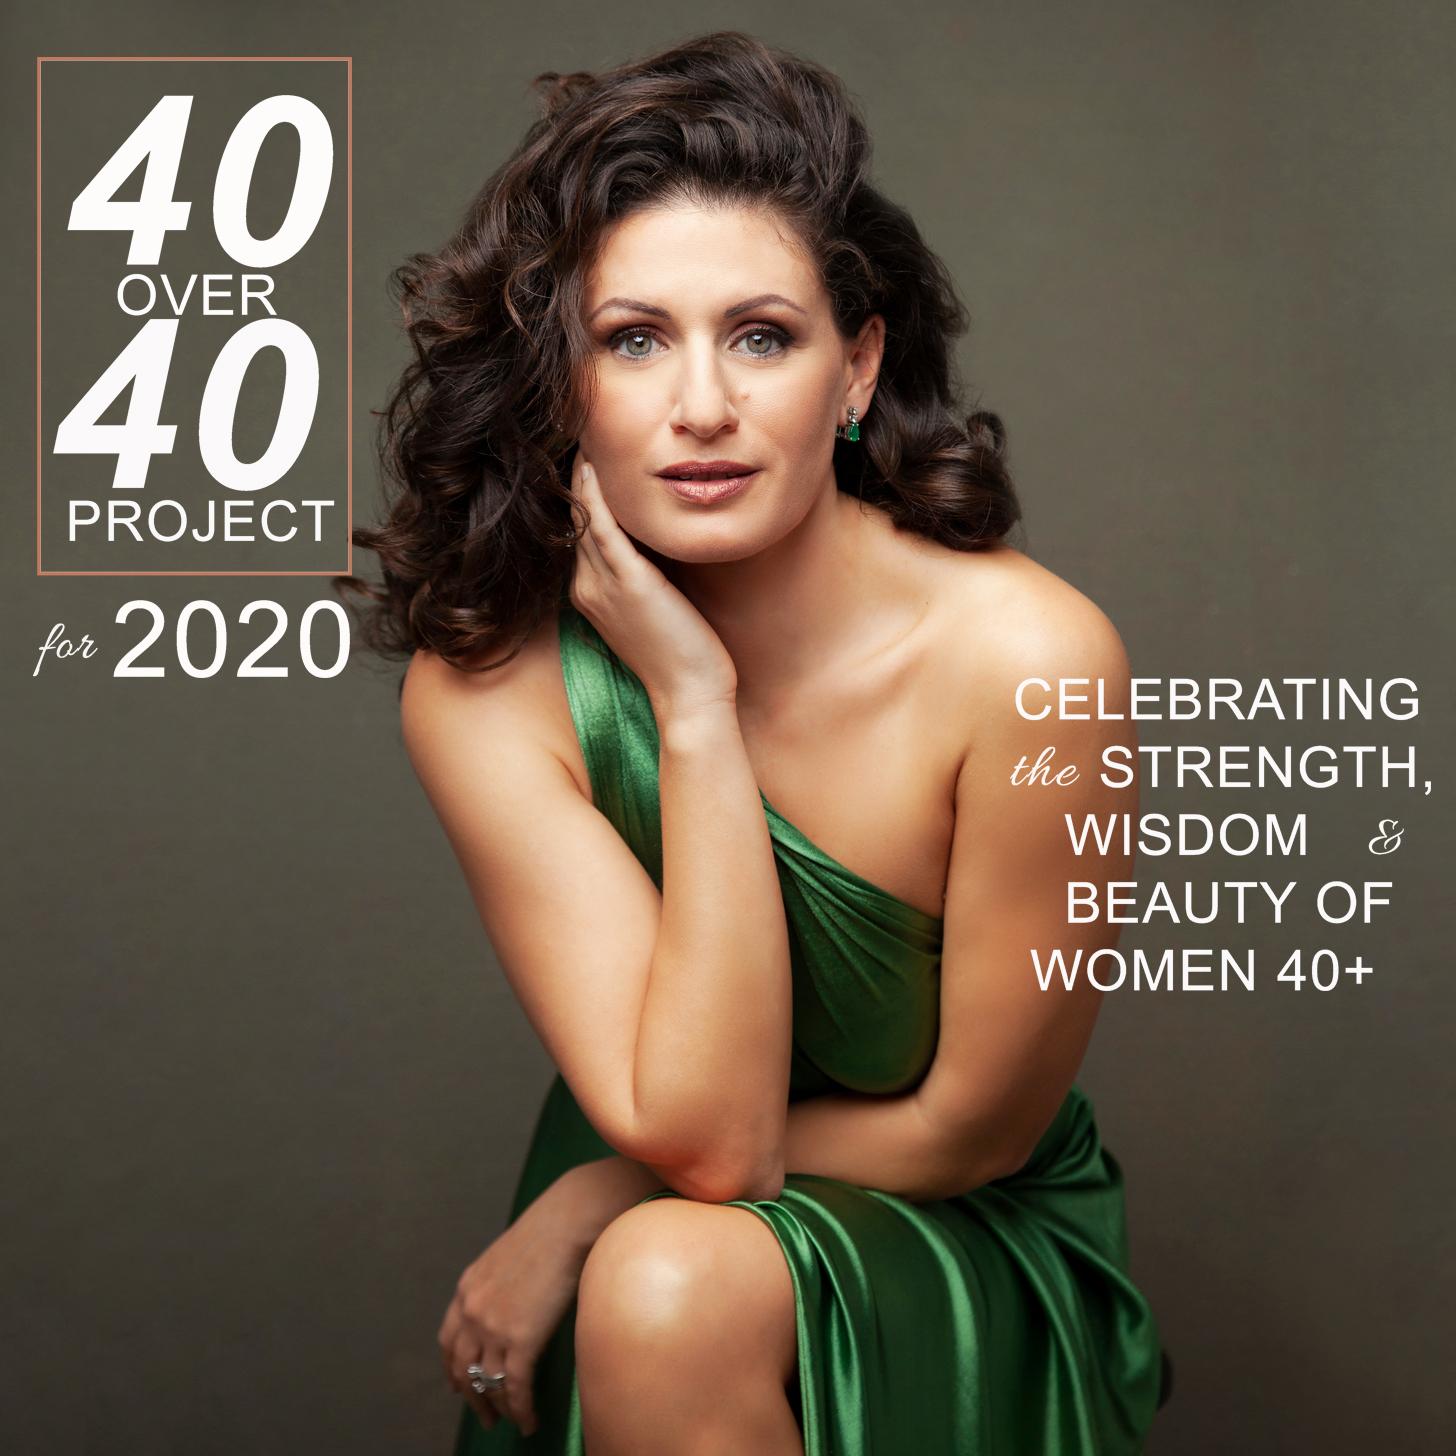 40over40 Photo Shoot  Amanda_Hsu_8975web-copy Portrait Session with Debbie Bonello